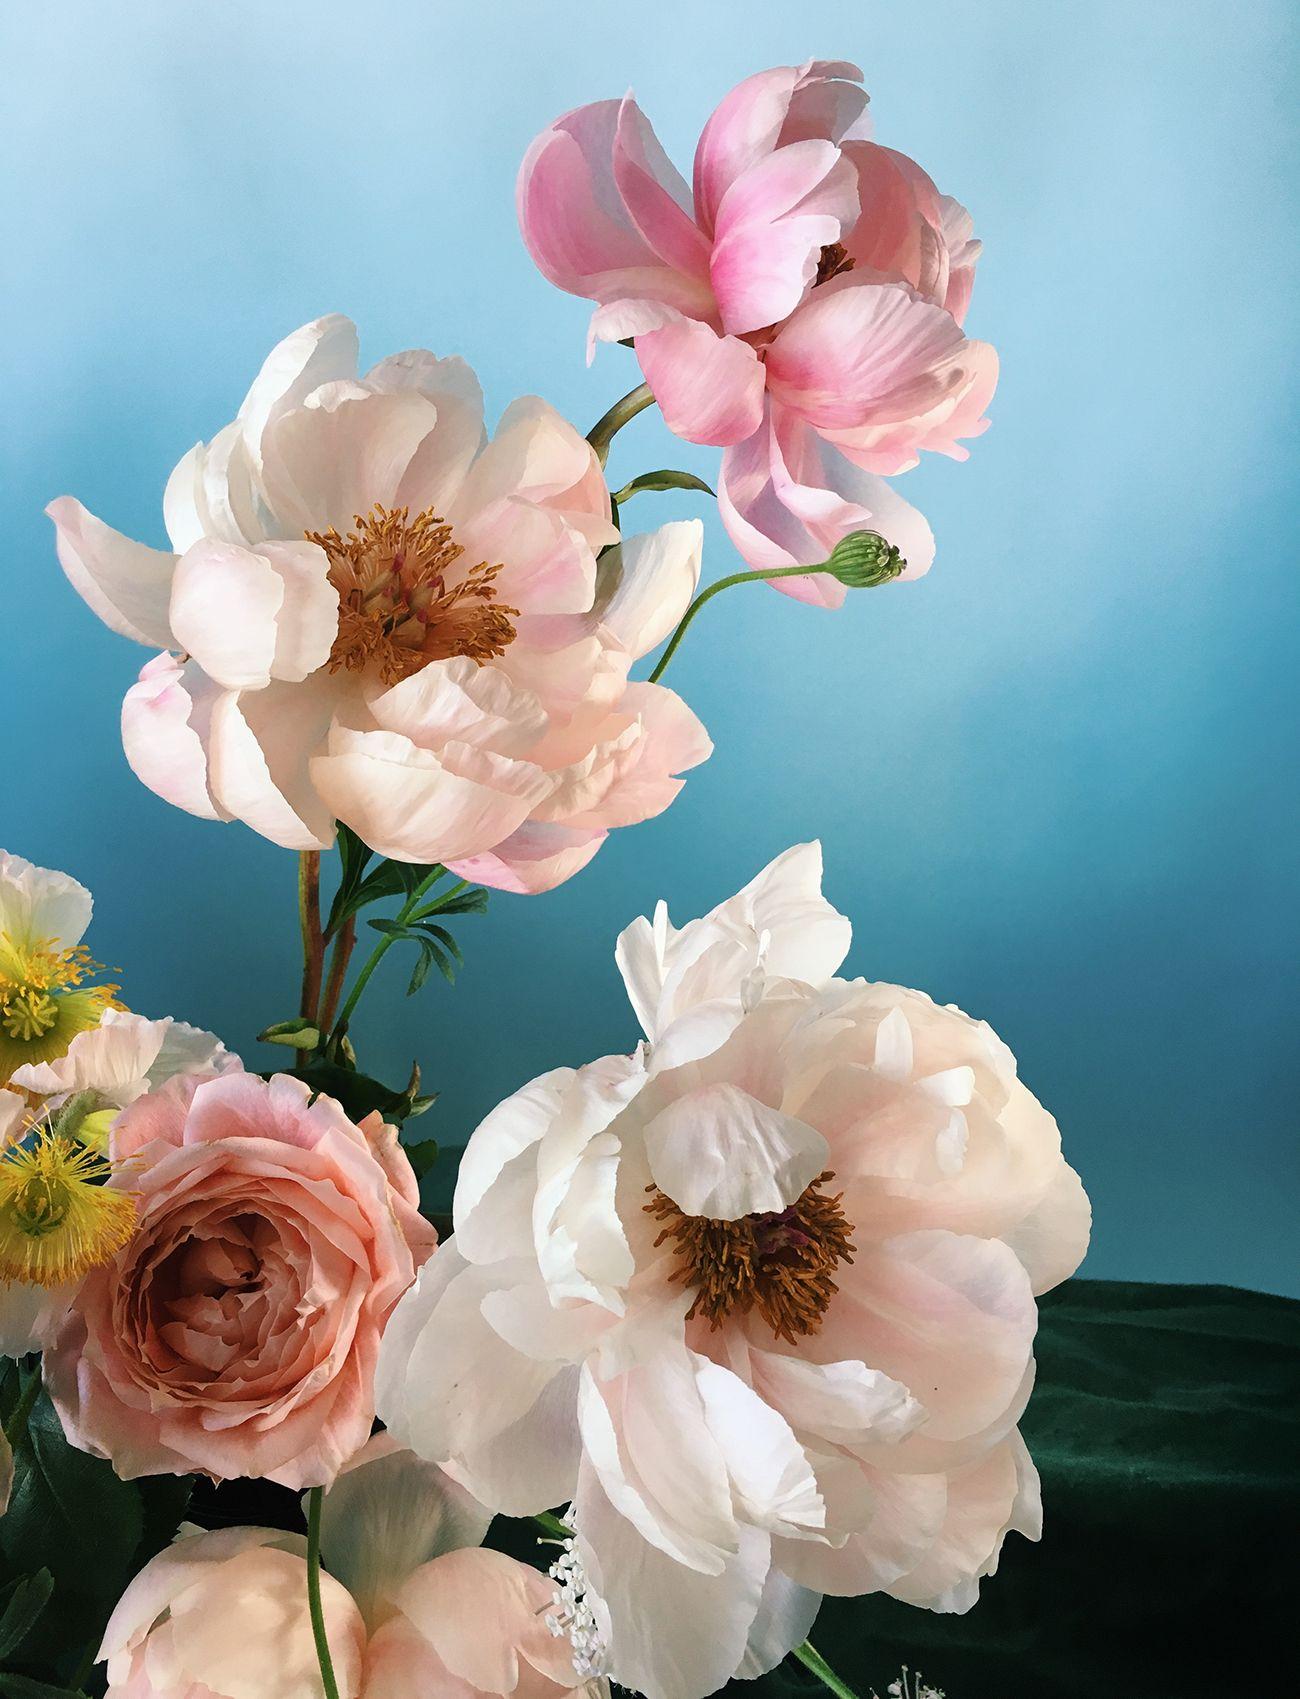 Meet the Florist Behind Instagrams Dreamiest Still Lifes